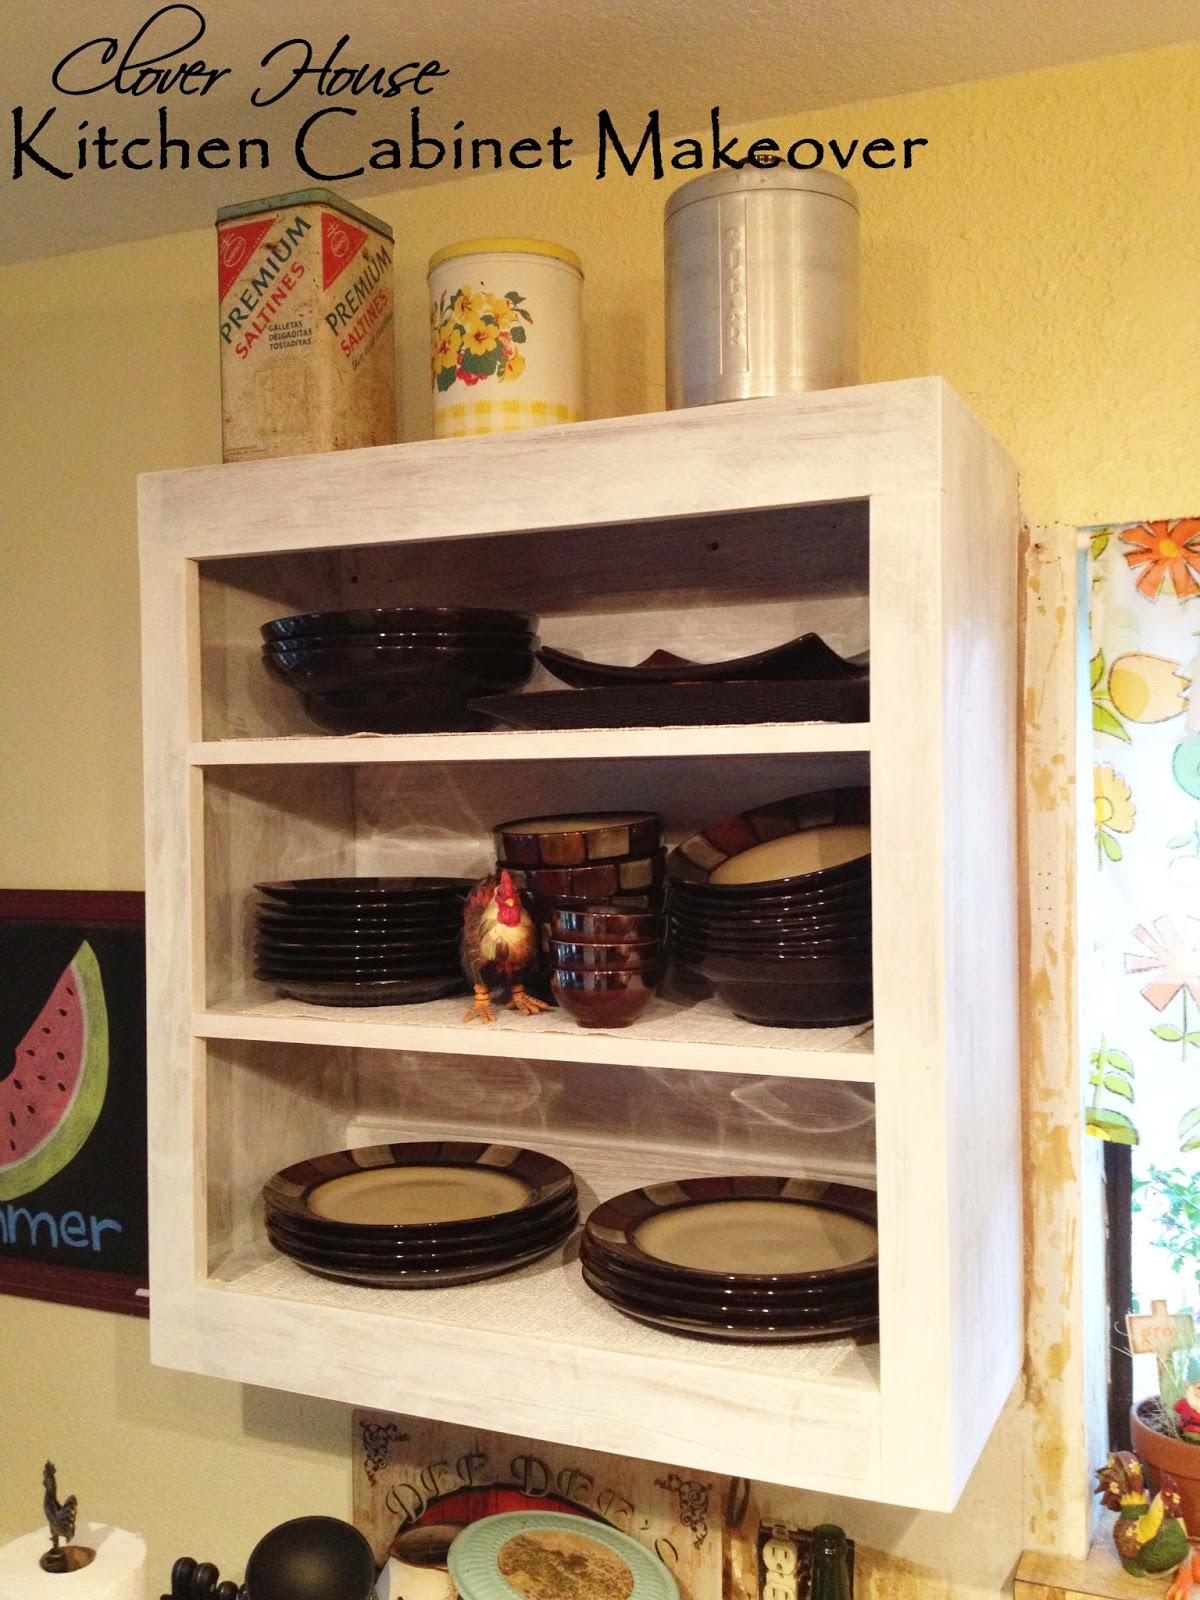 Clover House Kitchen Cabinet Makeover